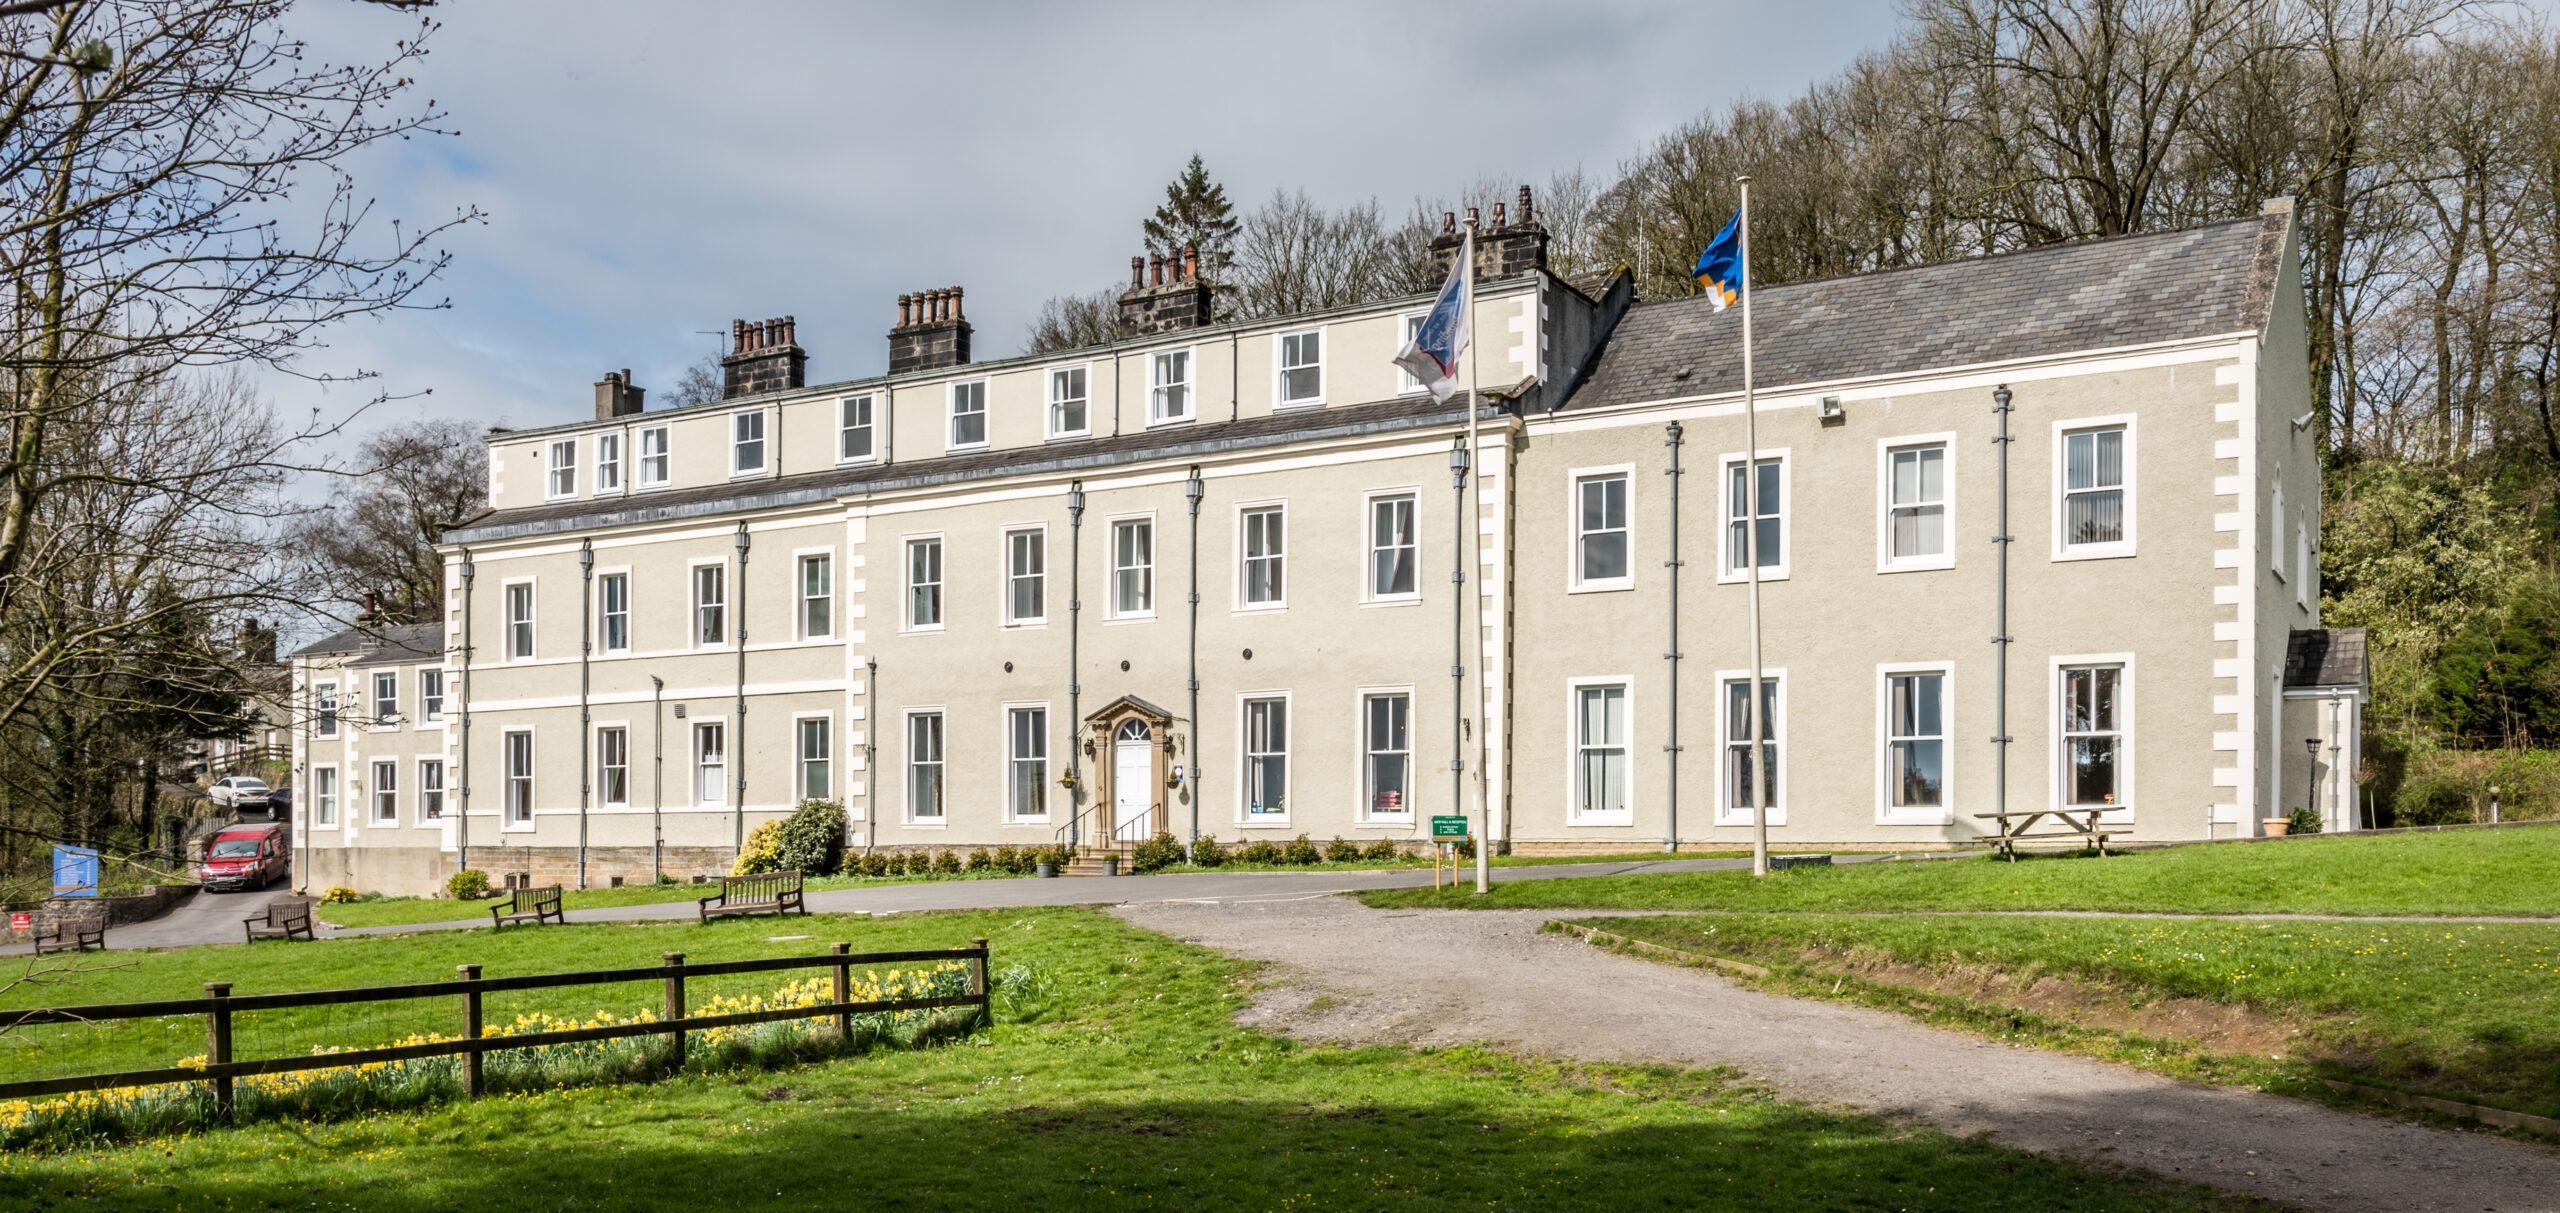 Waddow Hall